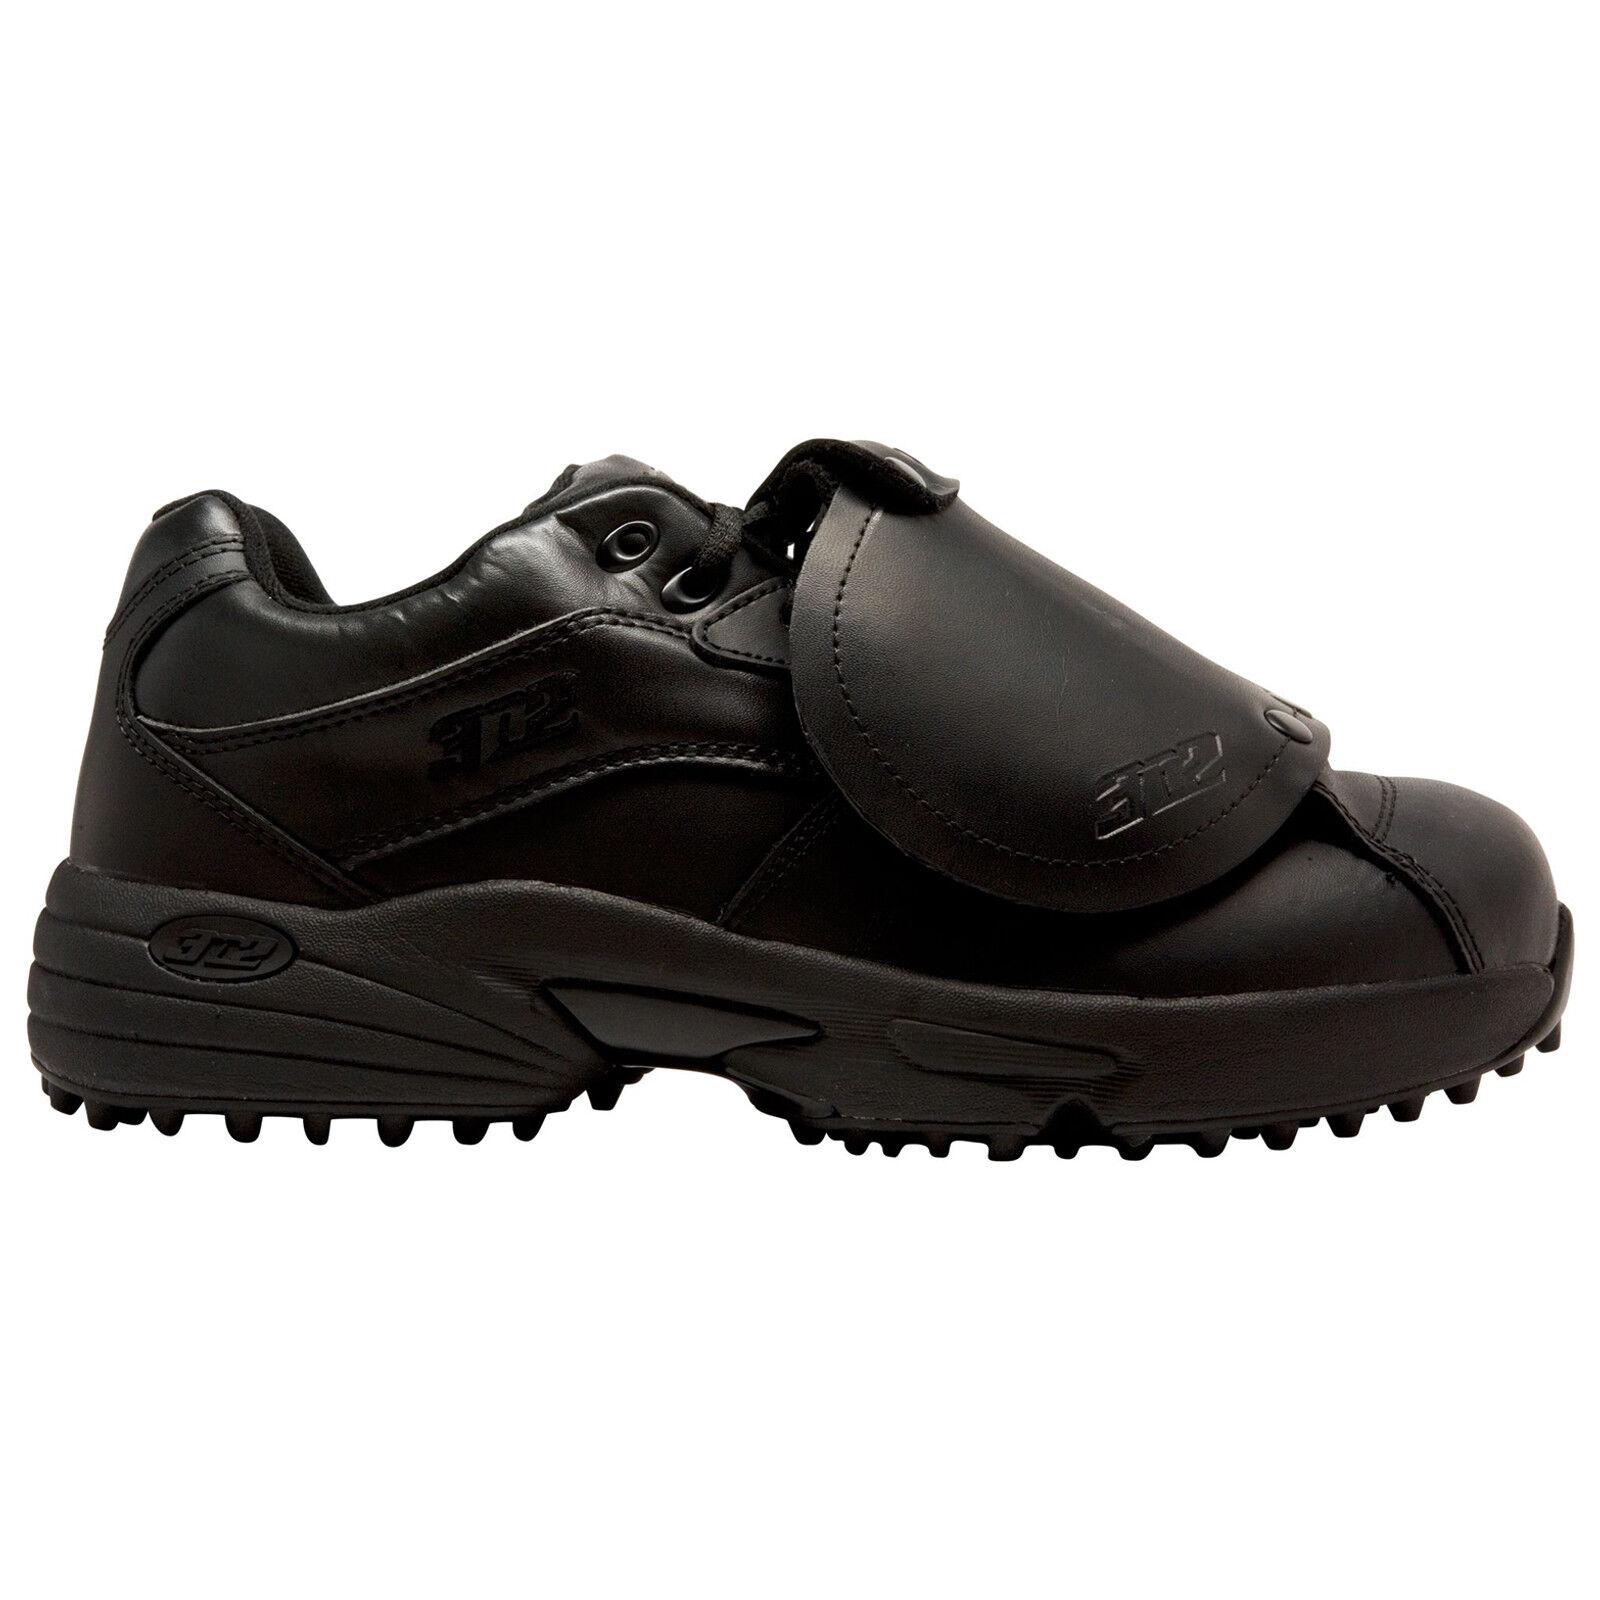 3n2 ReacBinden Pro Plate Lo mannens Baseball Umpire schoenen --zwart (NIEUW) Lists @ 95